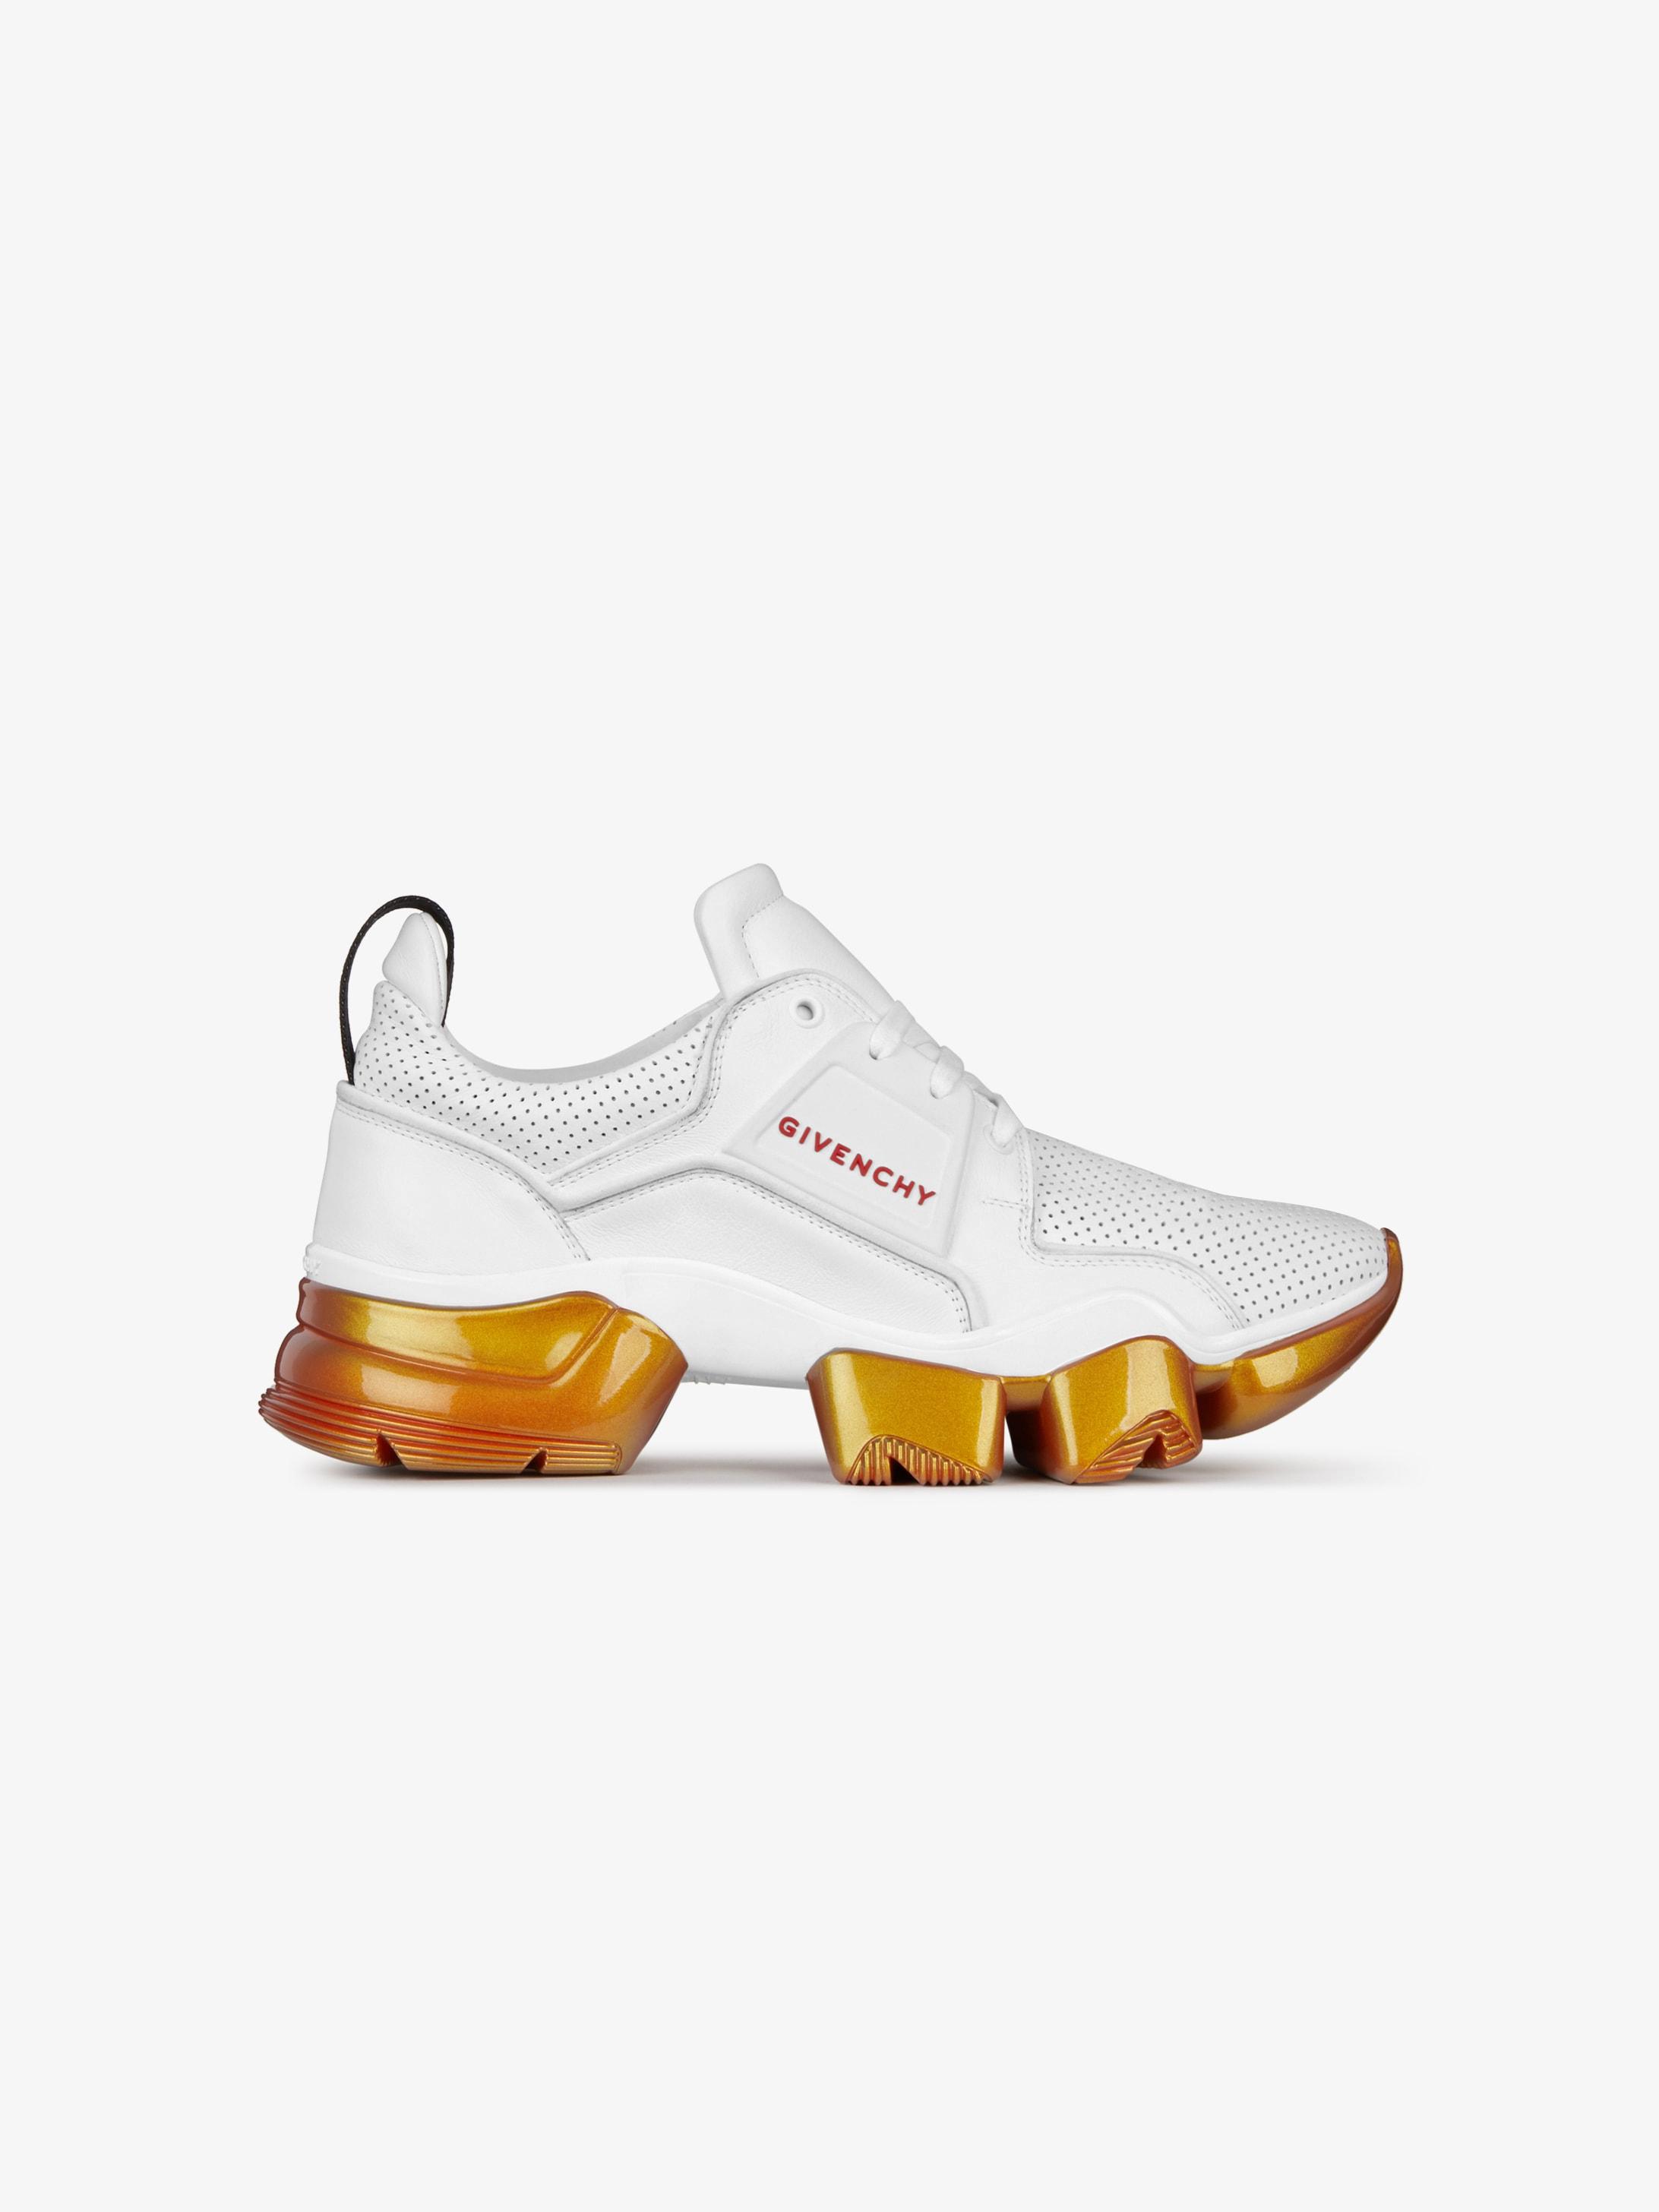 Sneakers Jaw en cuir perforé à semelles iridescentes